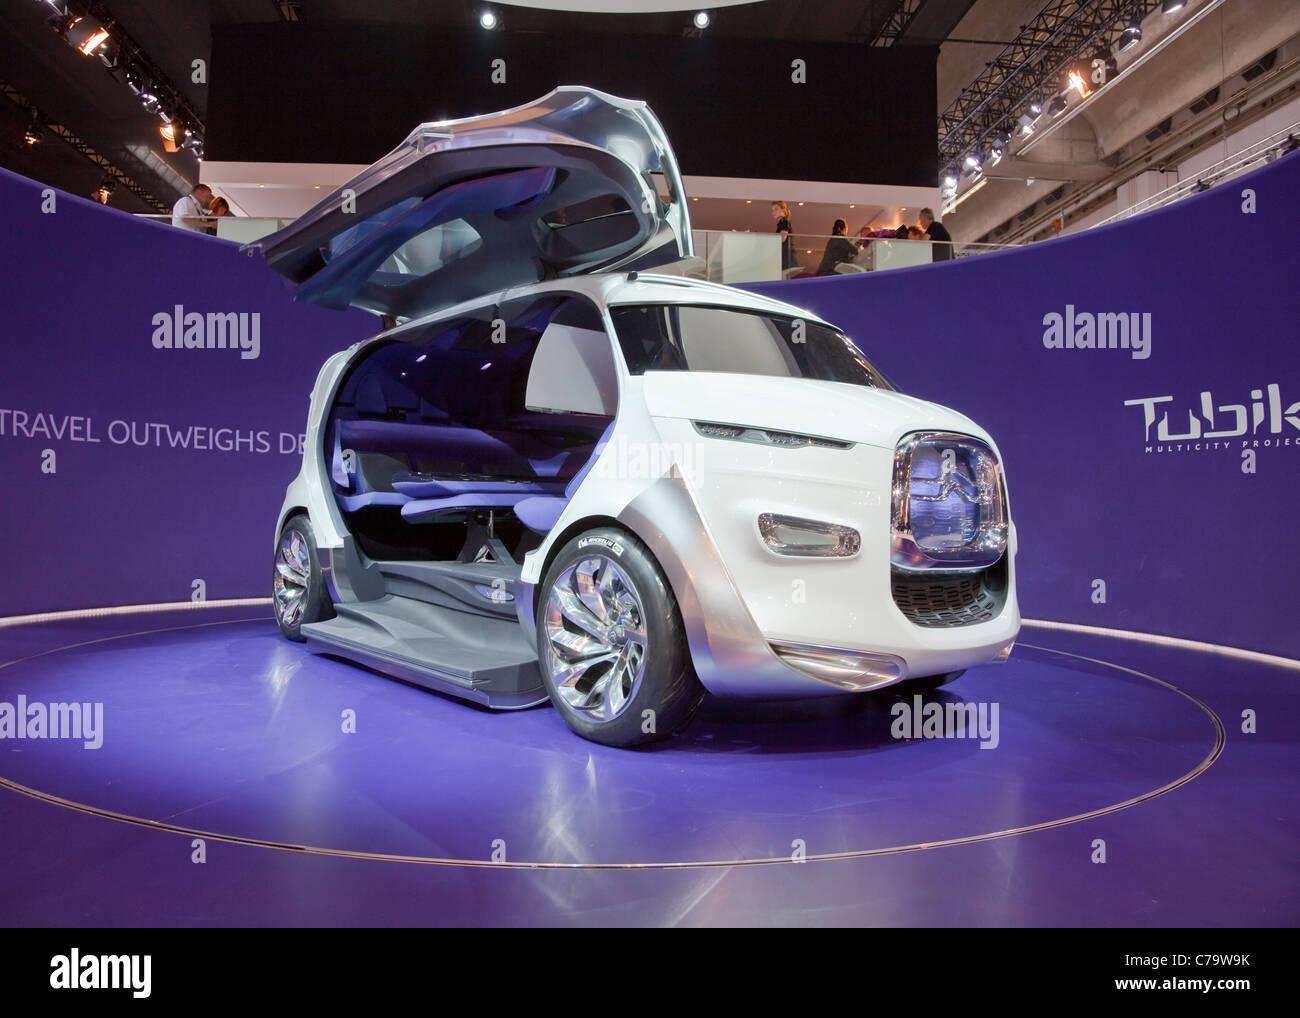 Citroen Tubik Concept Car on the IAA 2011 International Motor Show in Frankfurt am Main, Germany - Stock Image